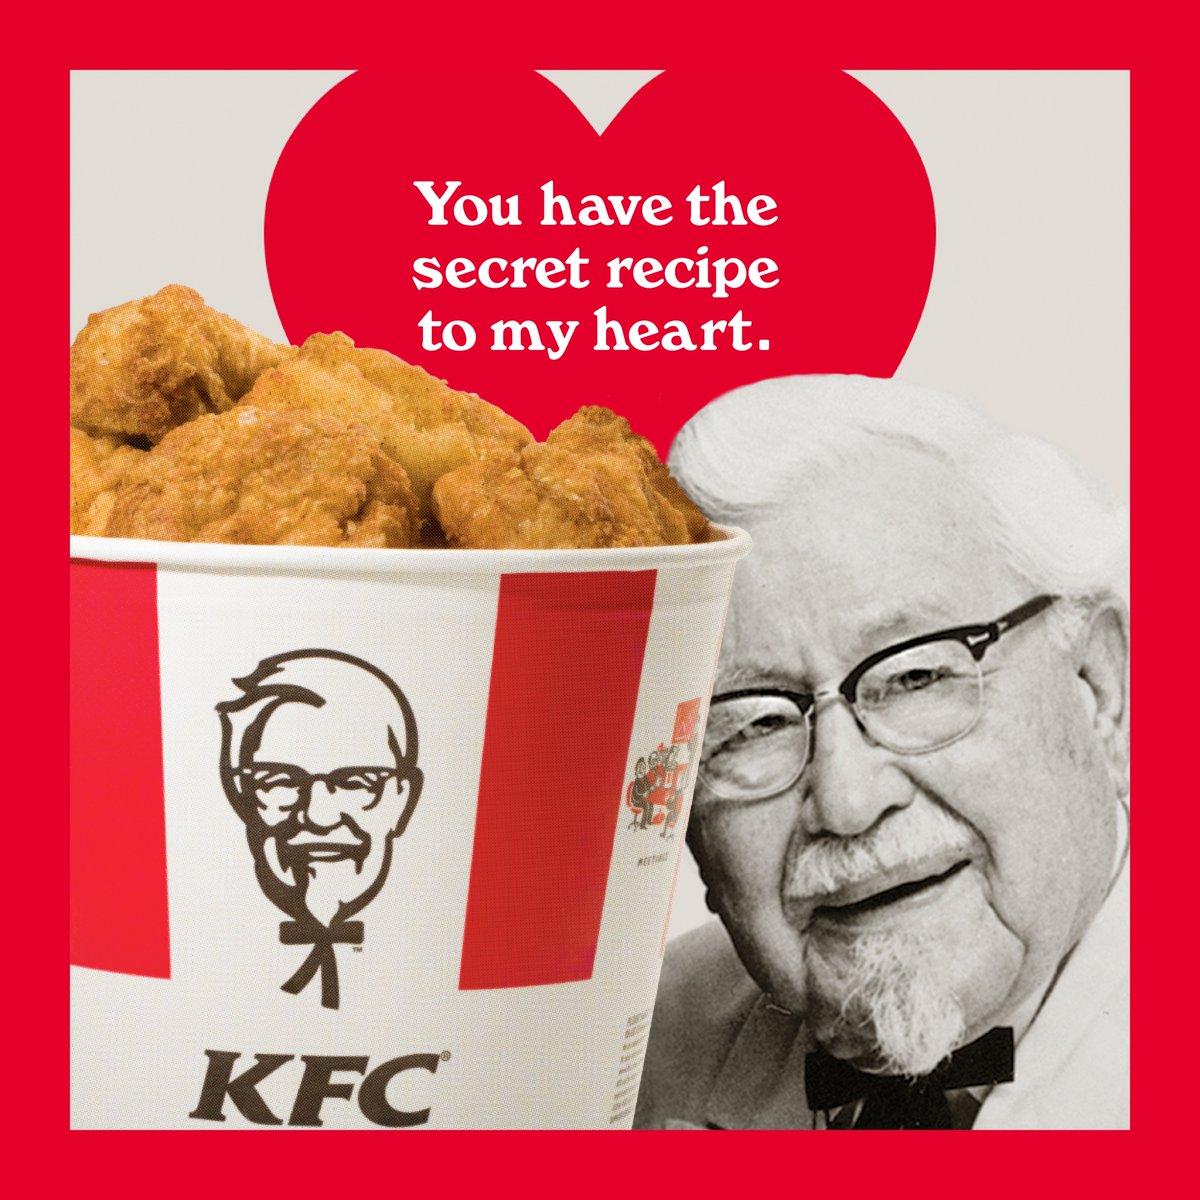 KFC Kfc Twitter